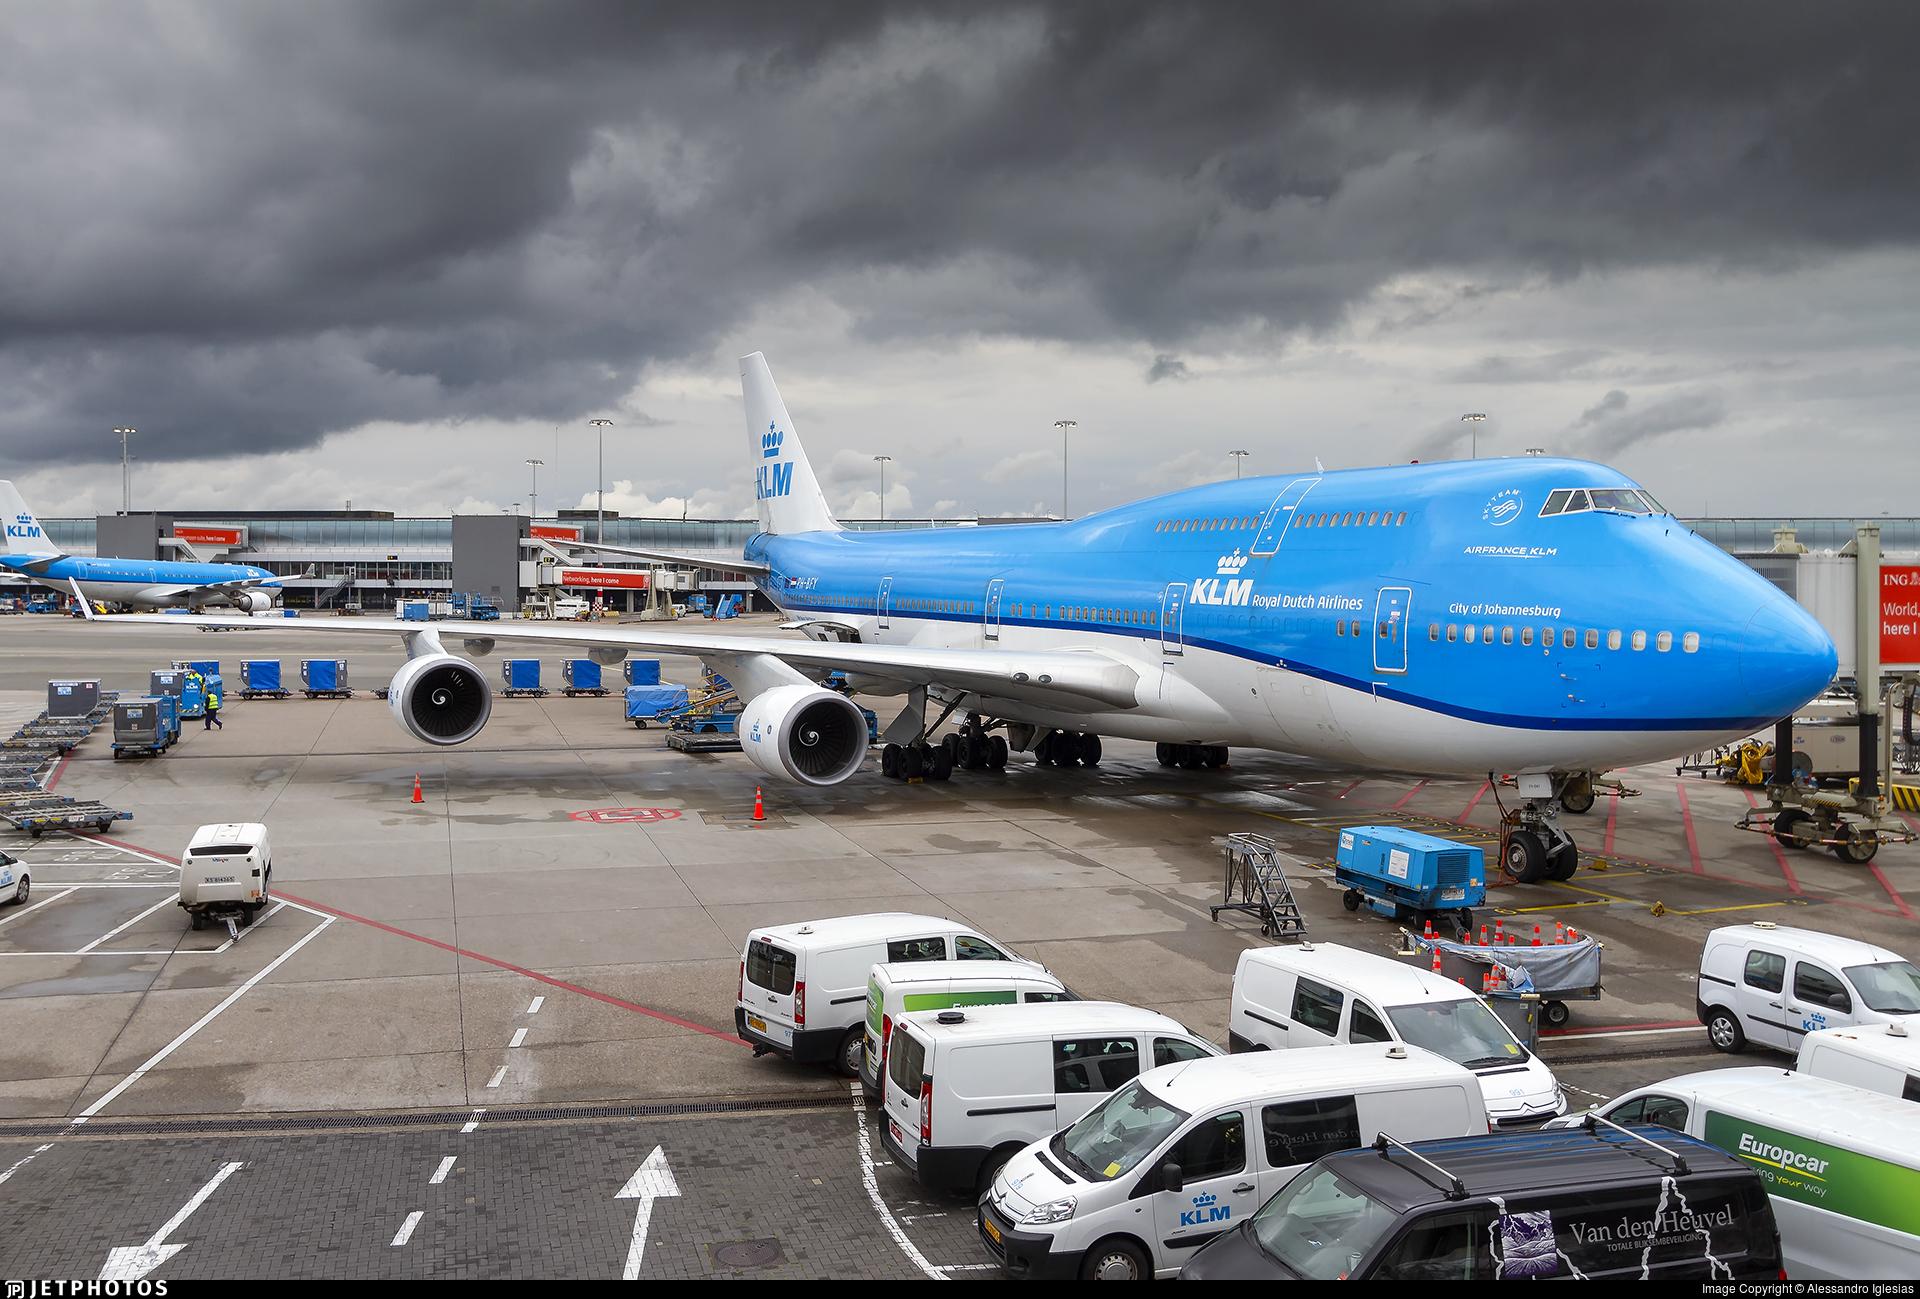 PH-BFY - Boeing 747-406(M) - KLM Royal Dutch Airlines